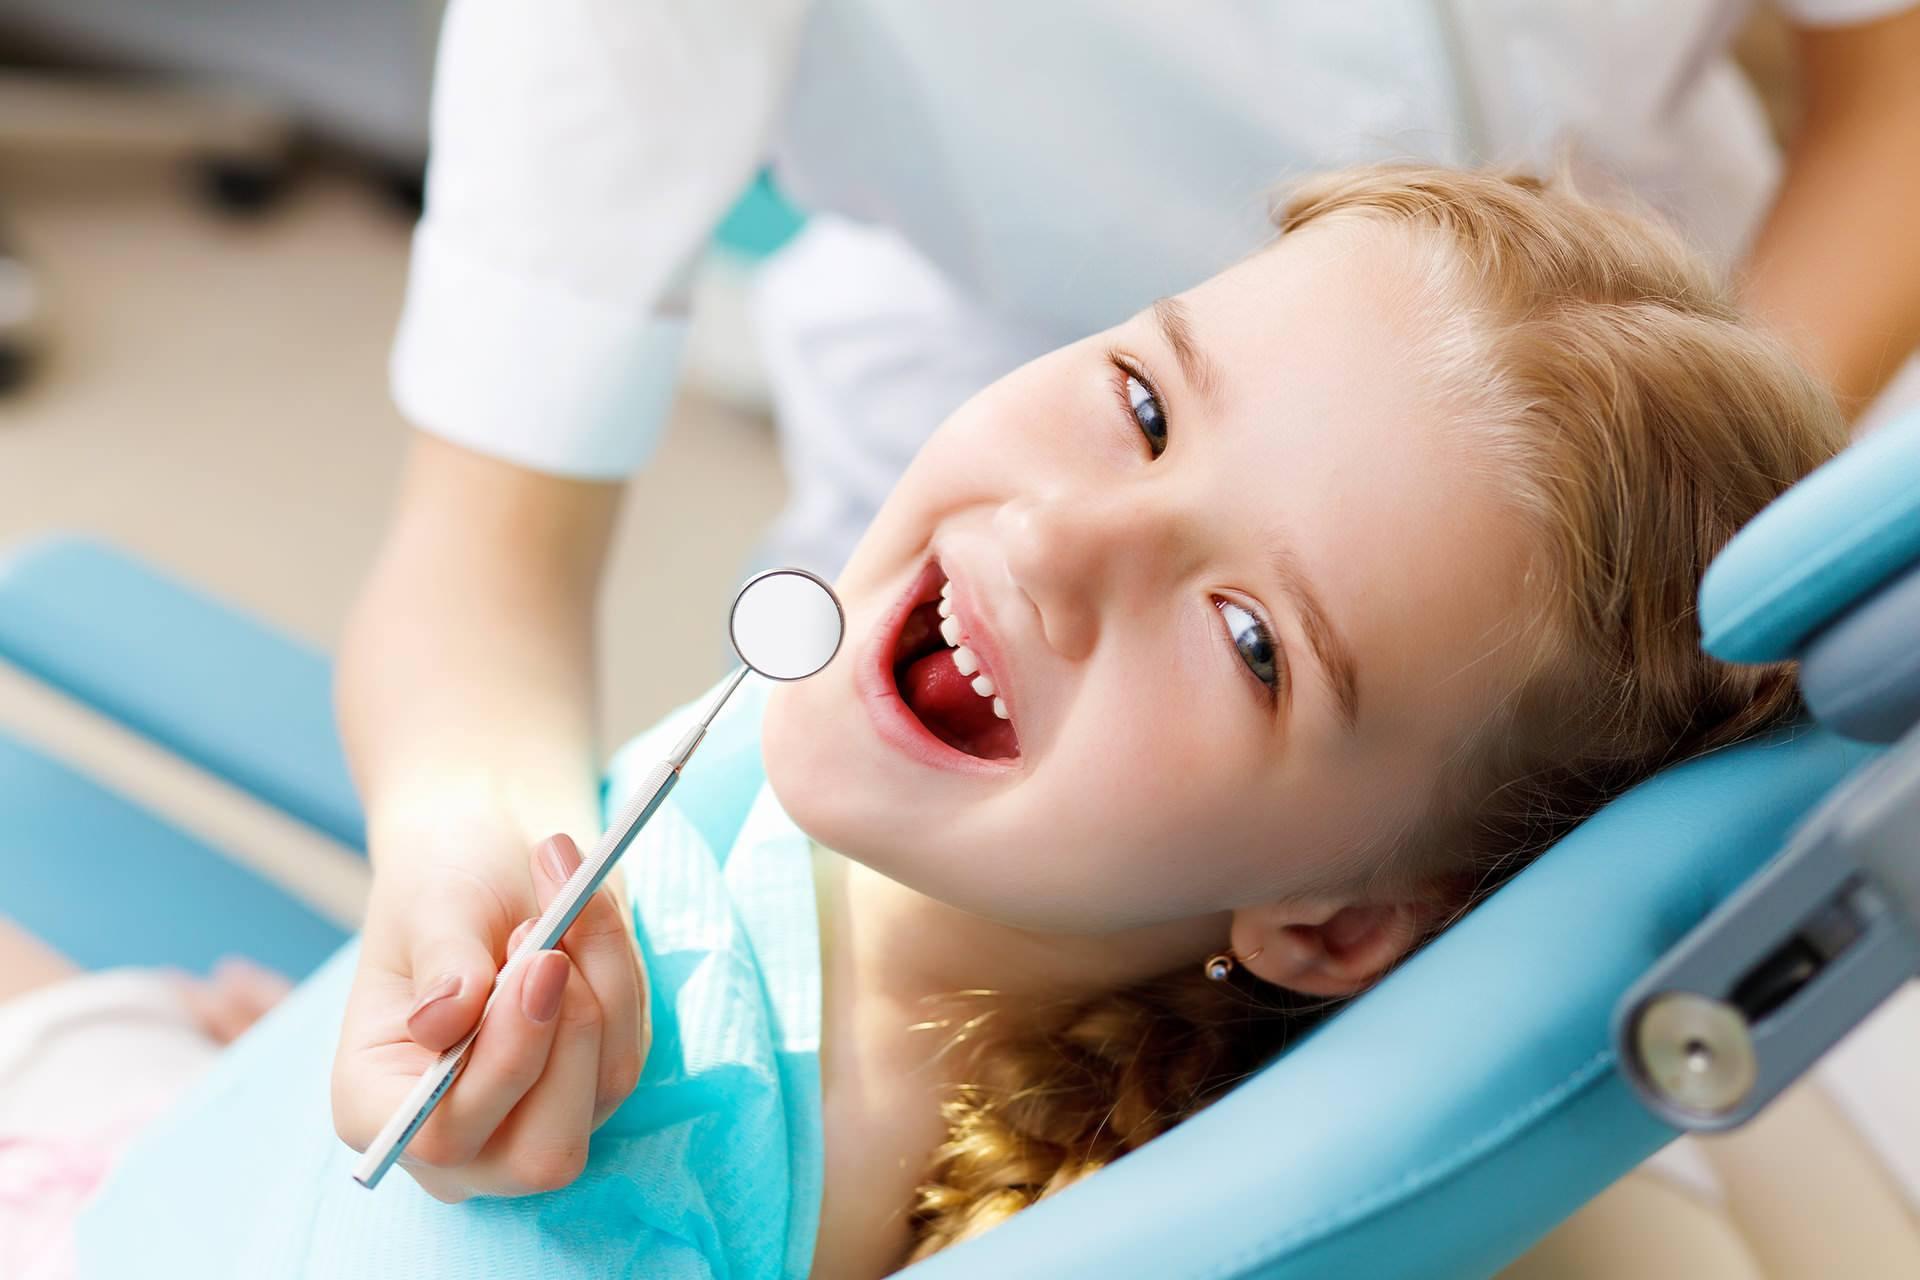 Salud dental infantil. Revisiones periódicas